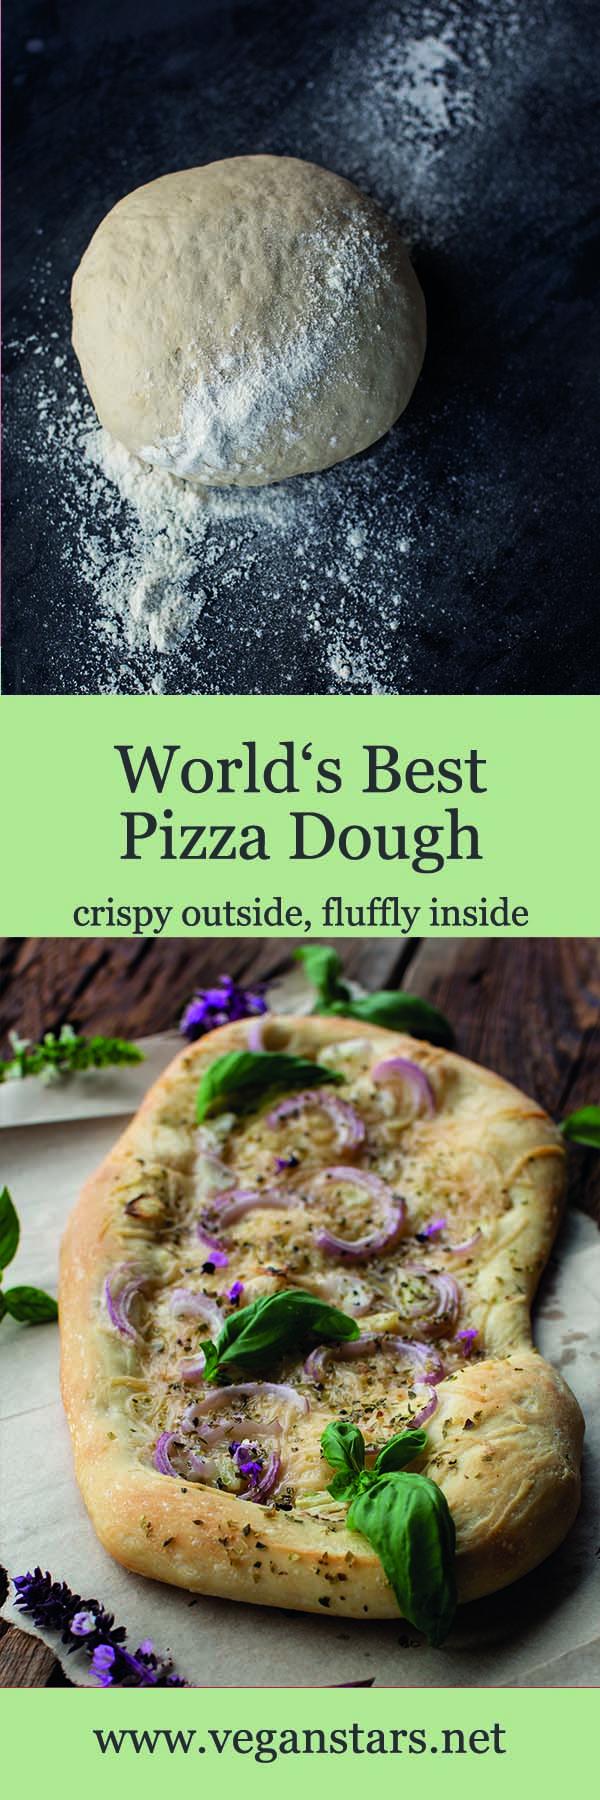 World's Best Pizza Dough